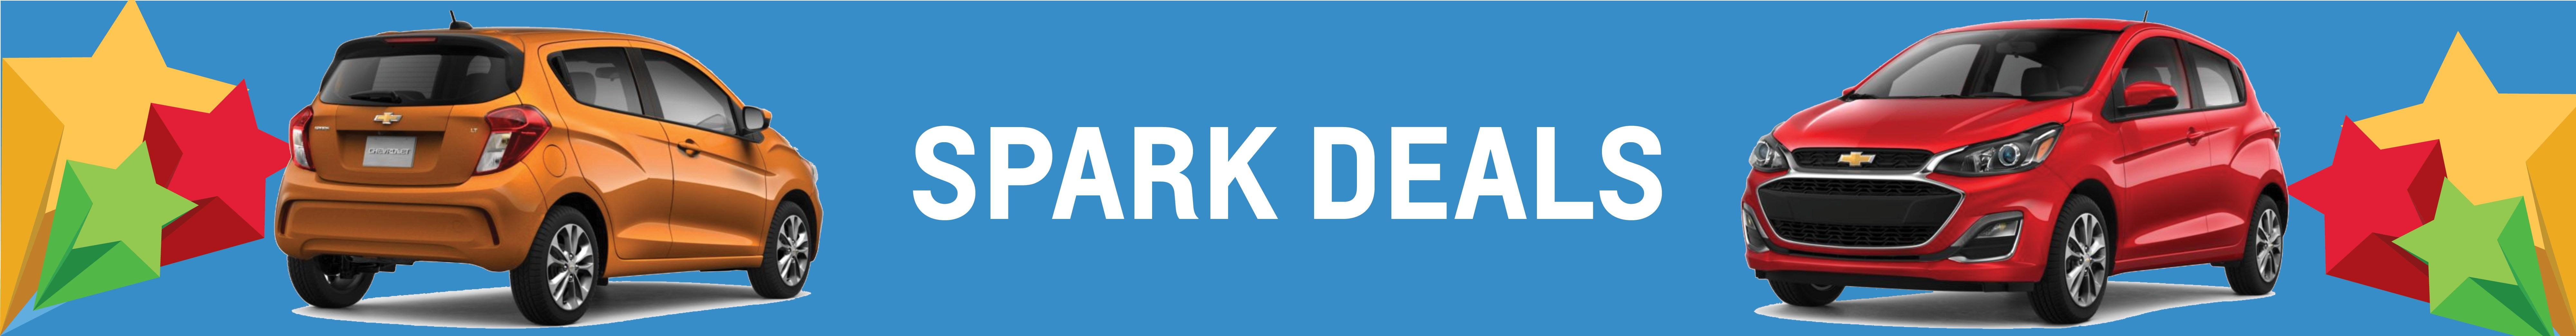 Spark Deals